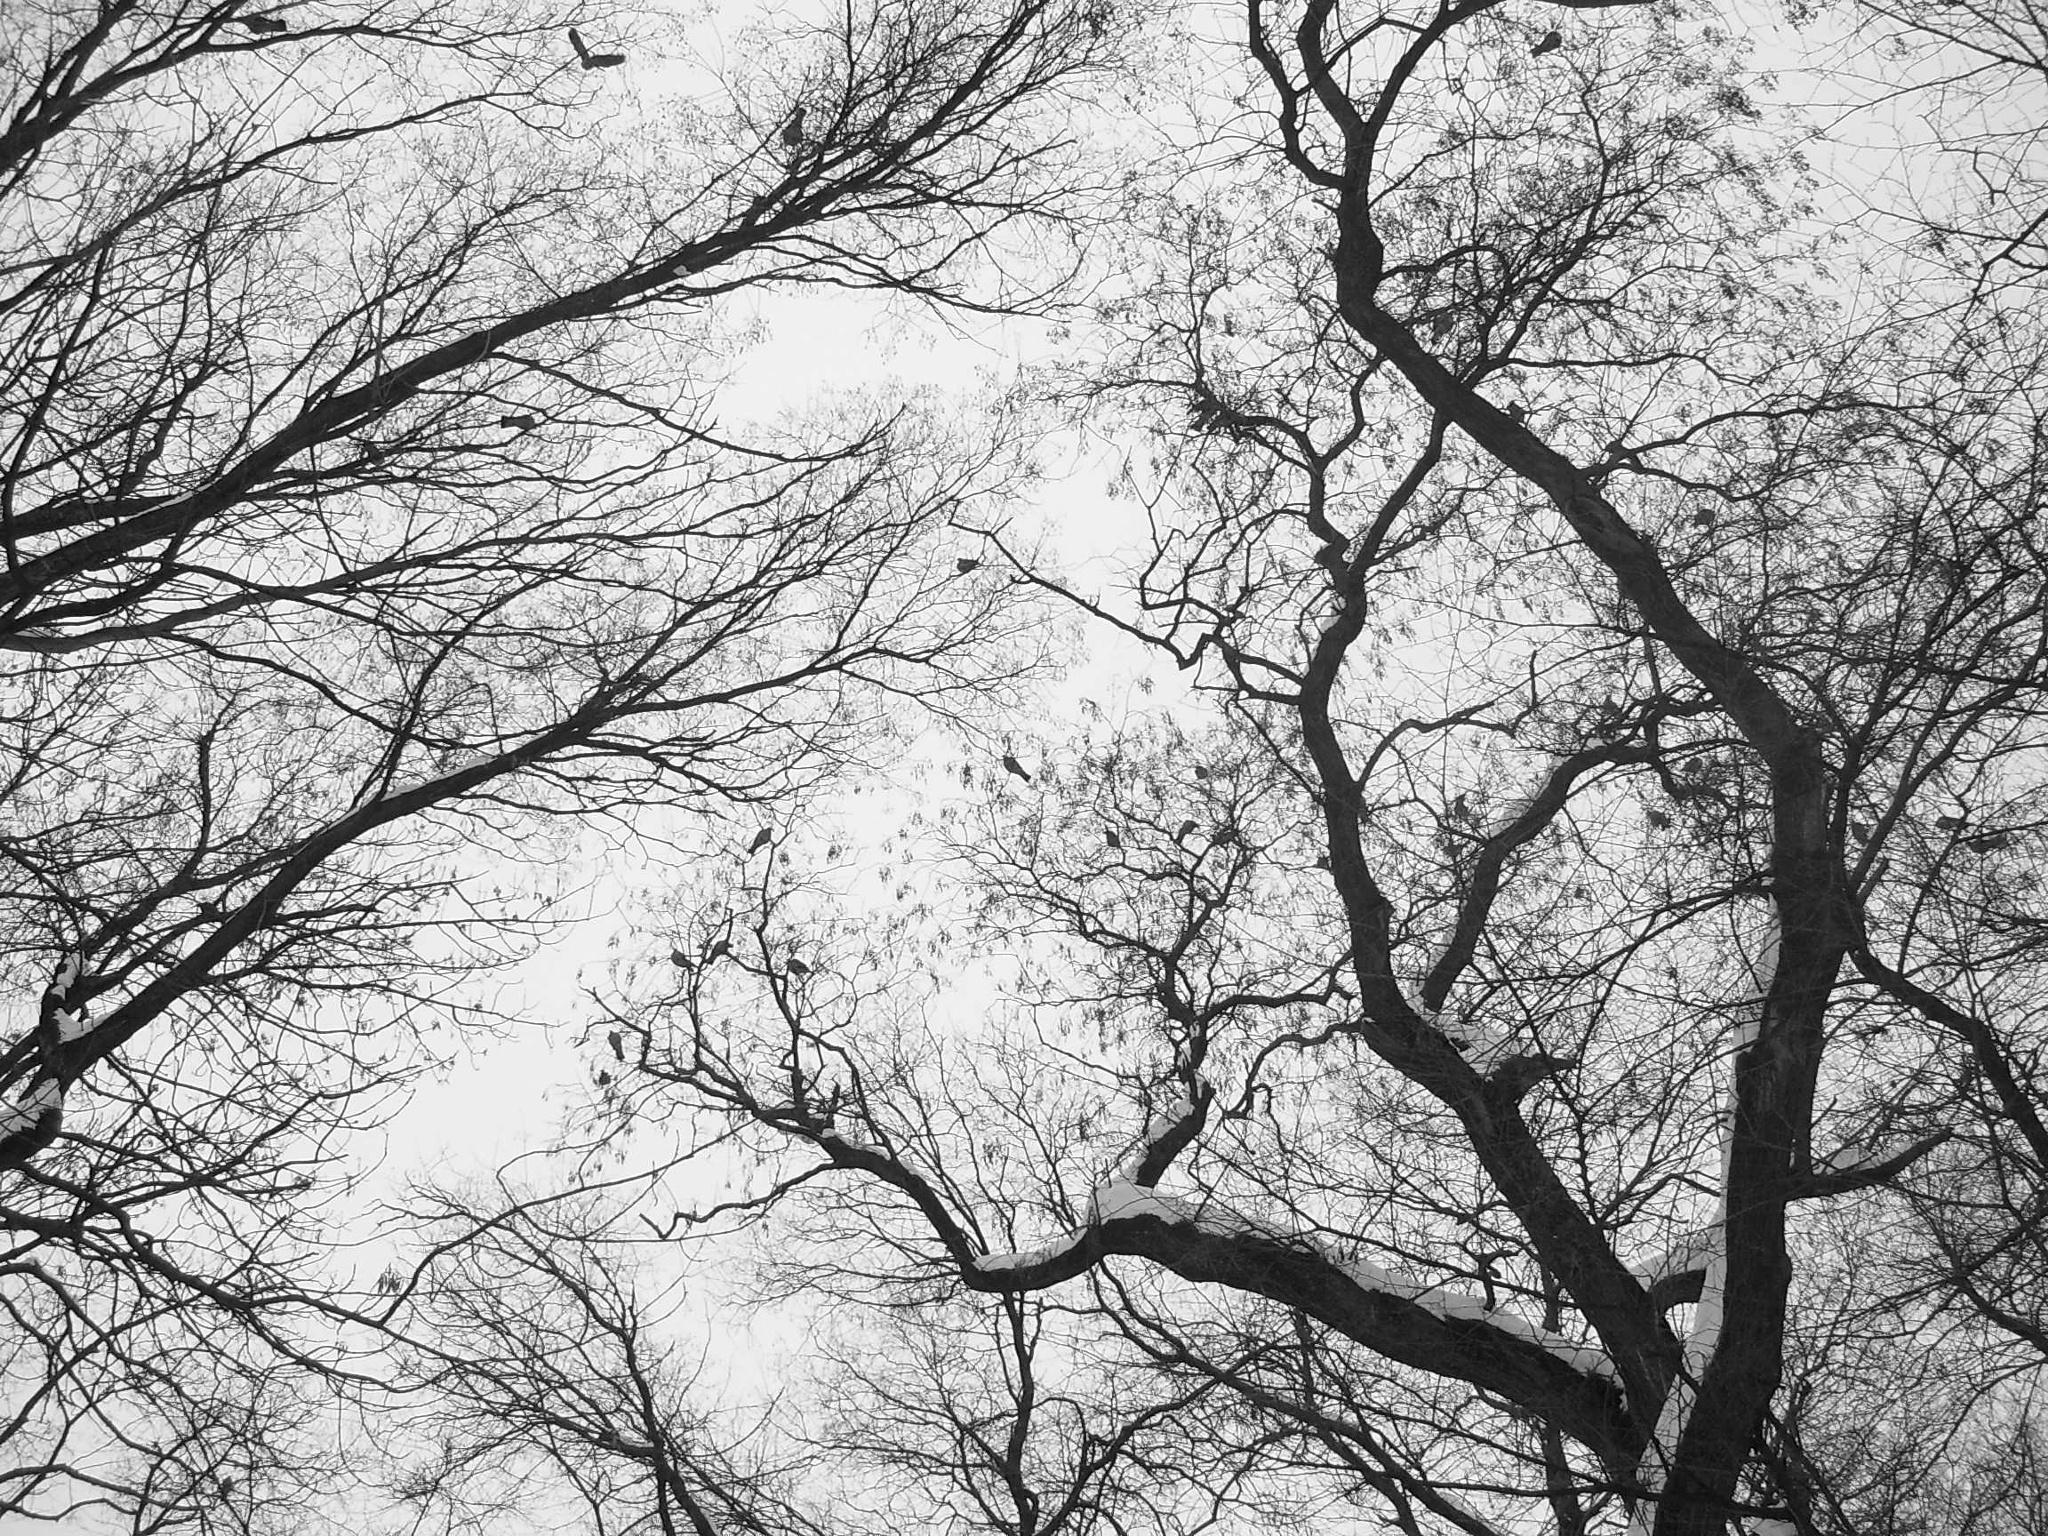 Untitled by Melitta Szathmary